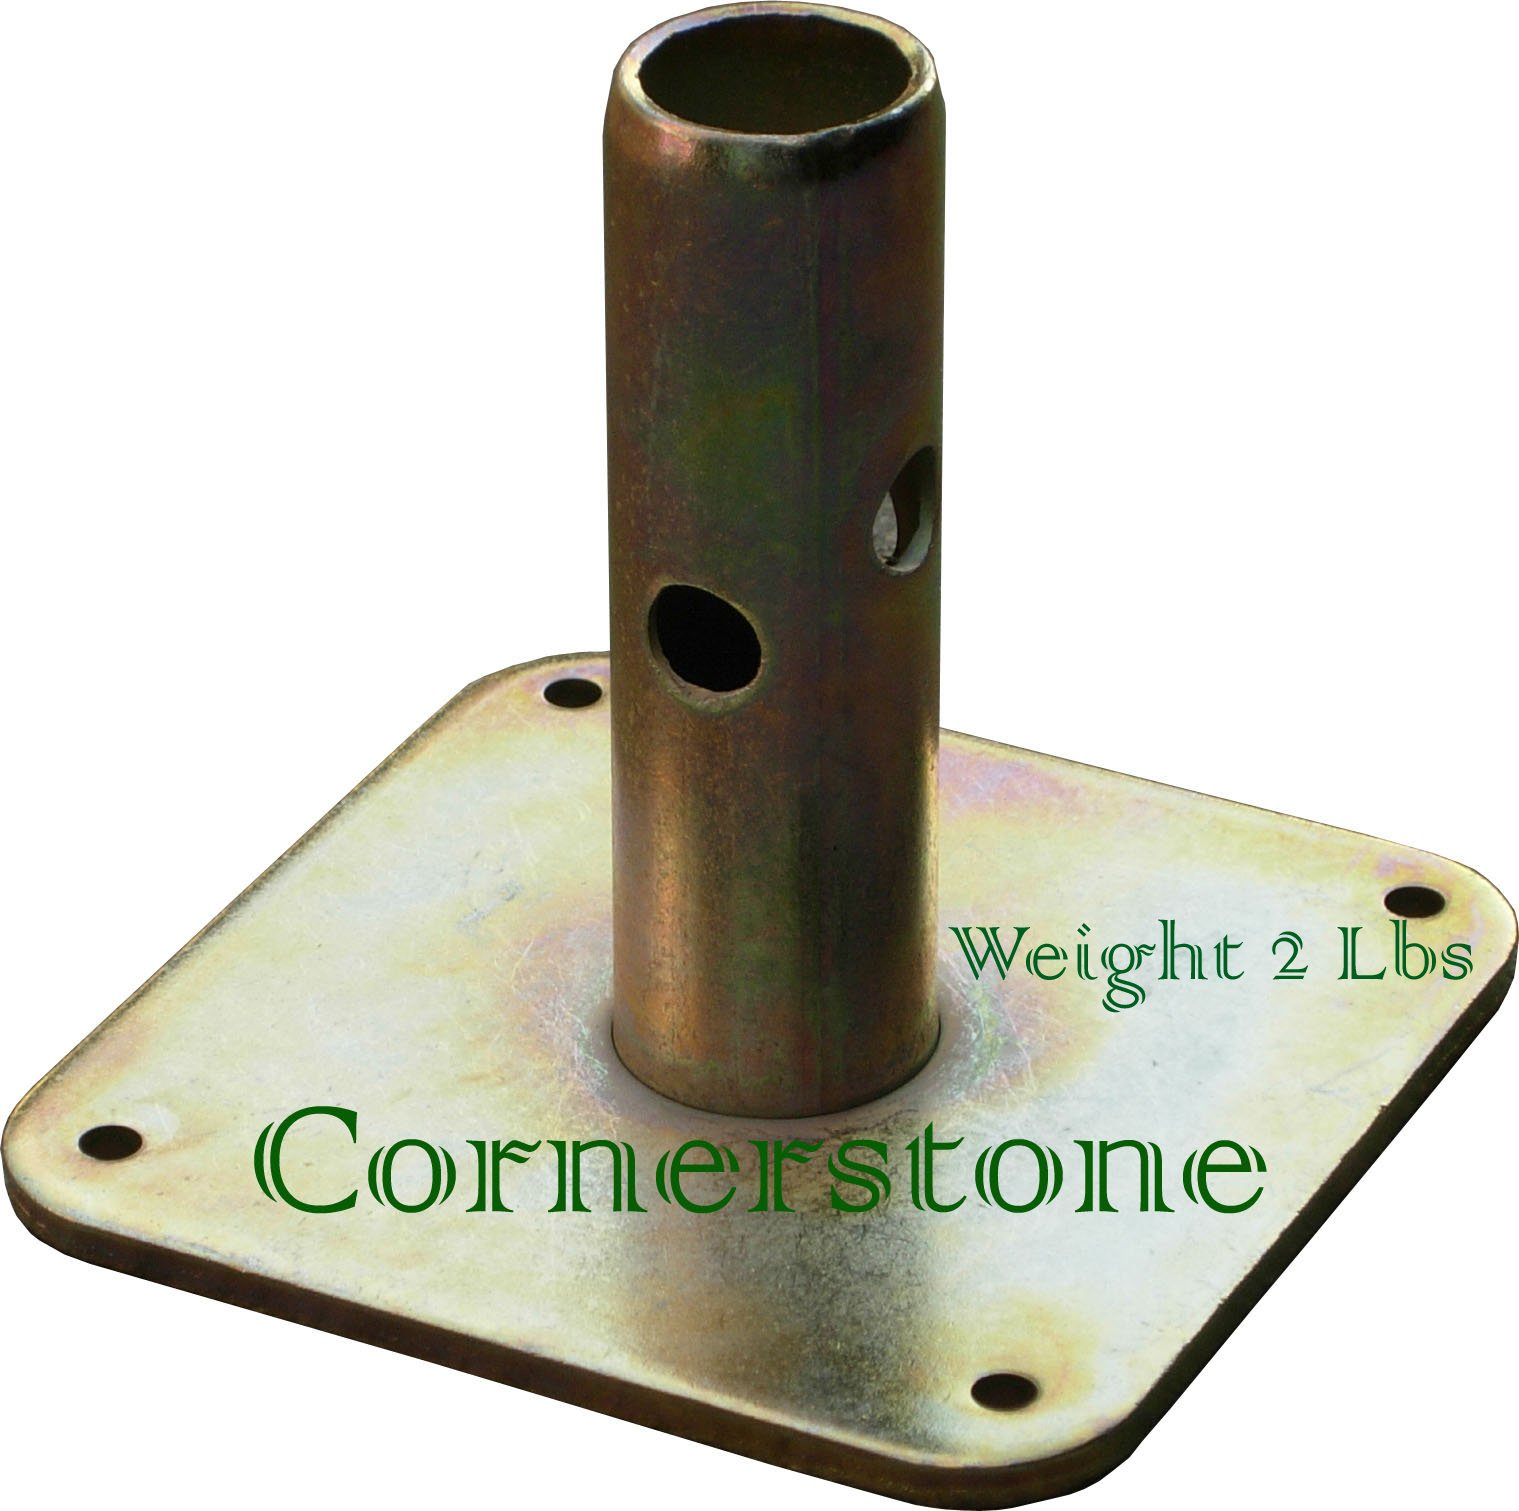 CBM scaffold 4 Quality Scaffolding Square Base Plate 5'' X 5'' Scaffold Frame Safety Base by Scaffold Base Plate